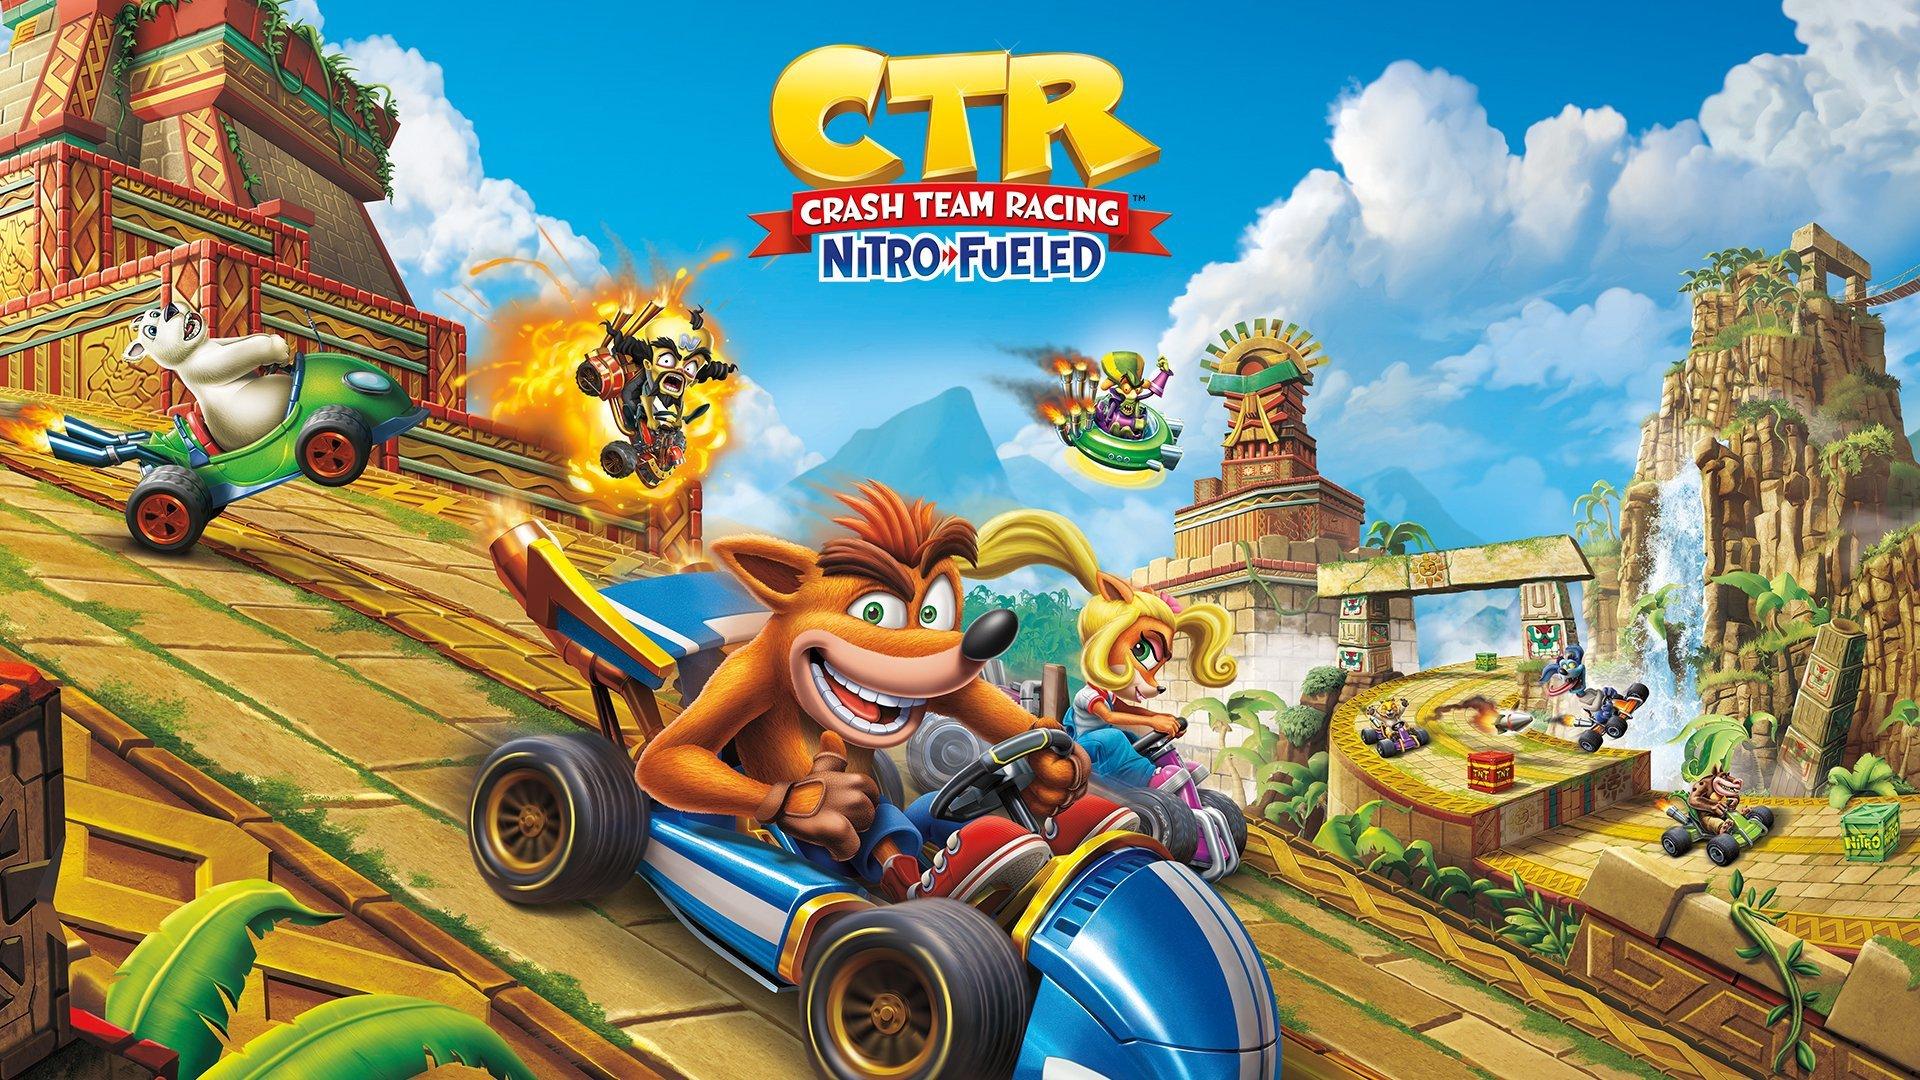 New Crash Bandicoot Game Lets You Play as Coco, Cortex